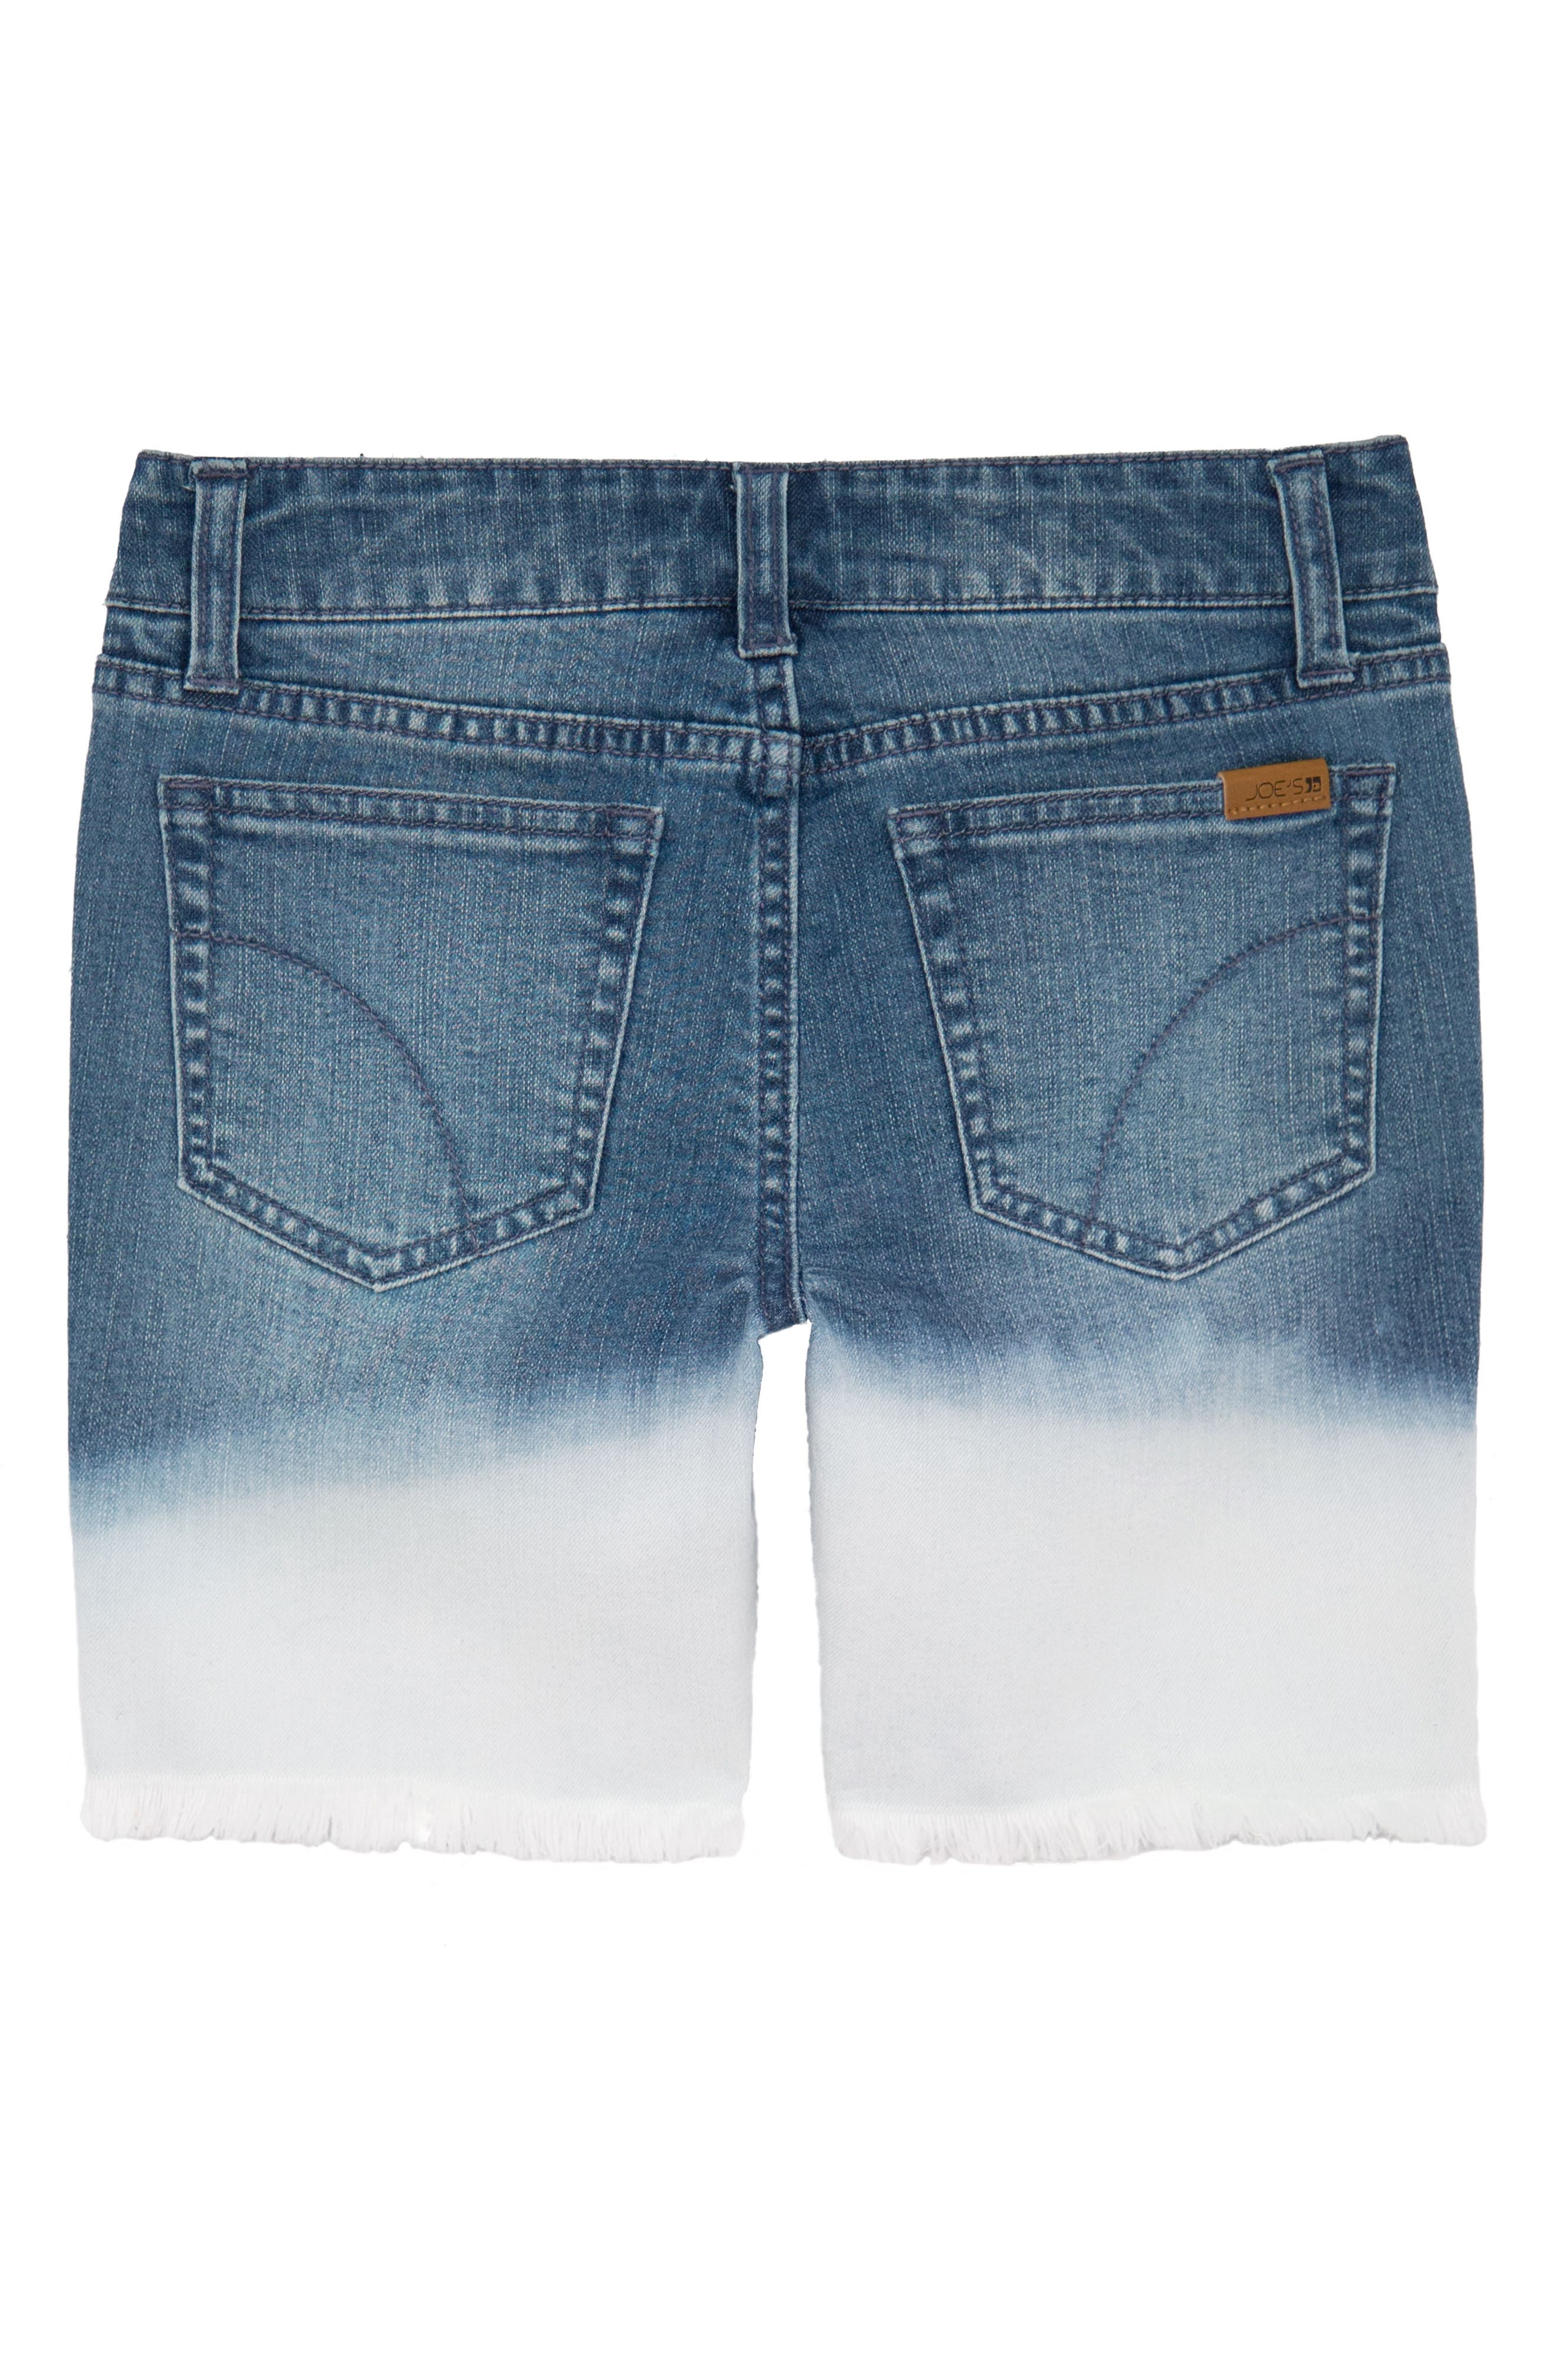 Joe's Distressed Bleach Denim Shorts,                             Alternate thumbnail 2, color,                             Wve-Wave